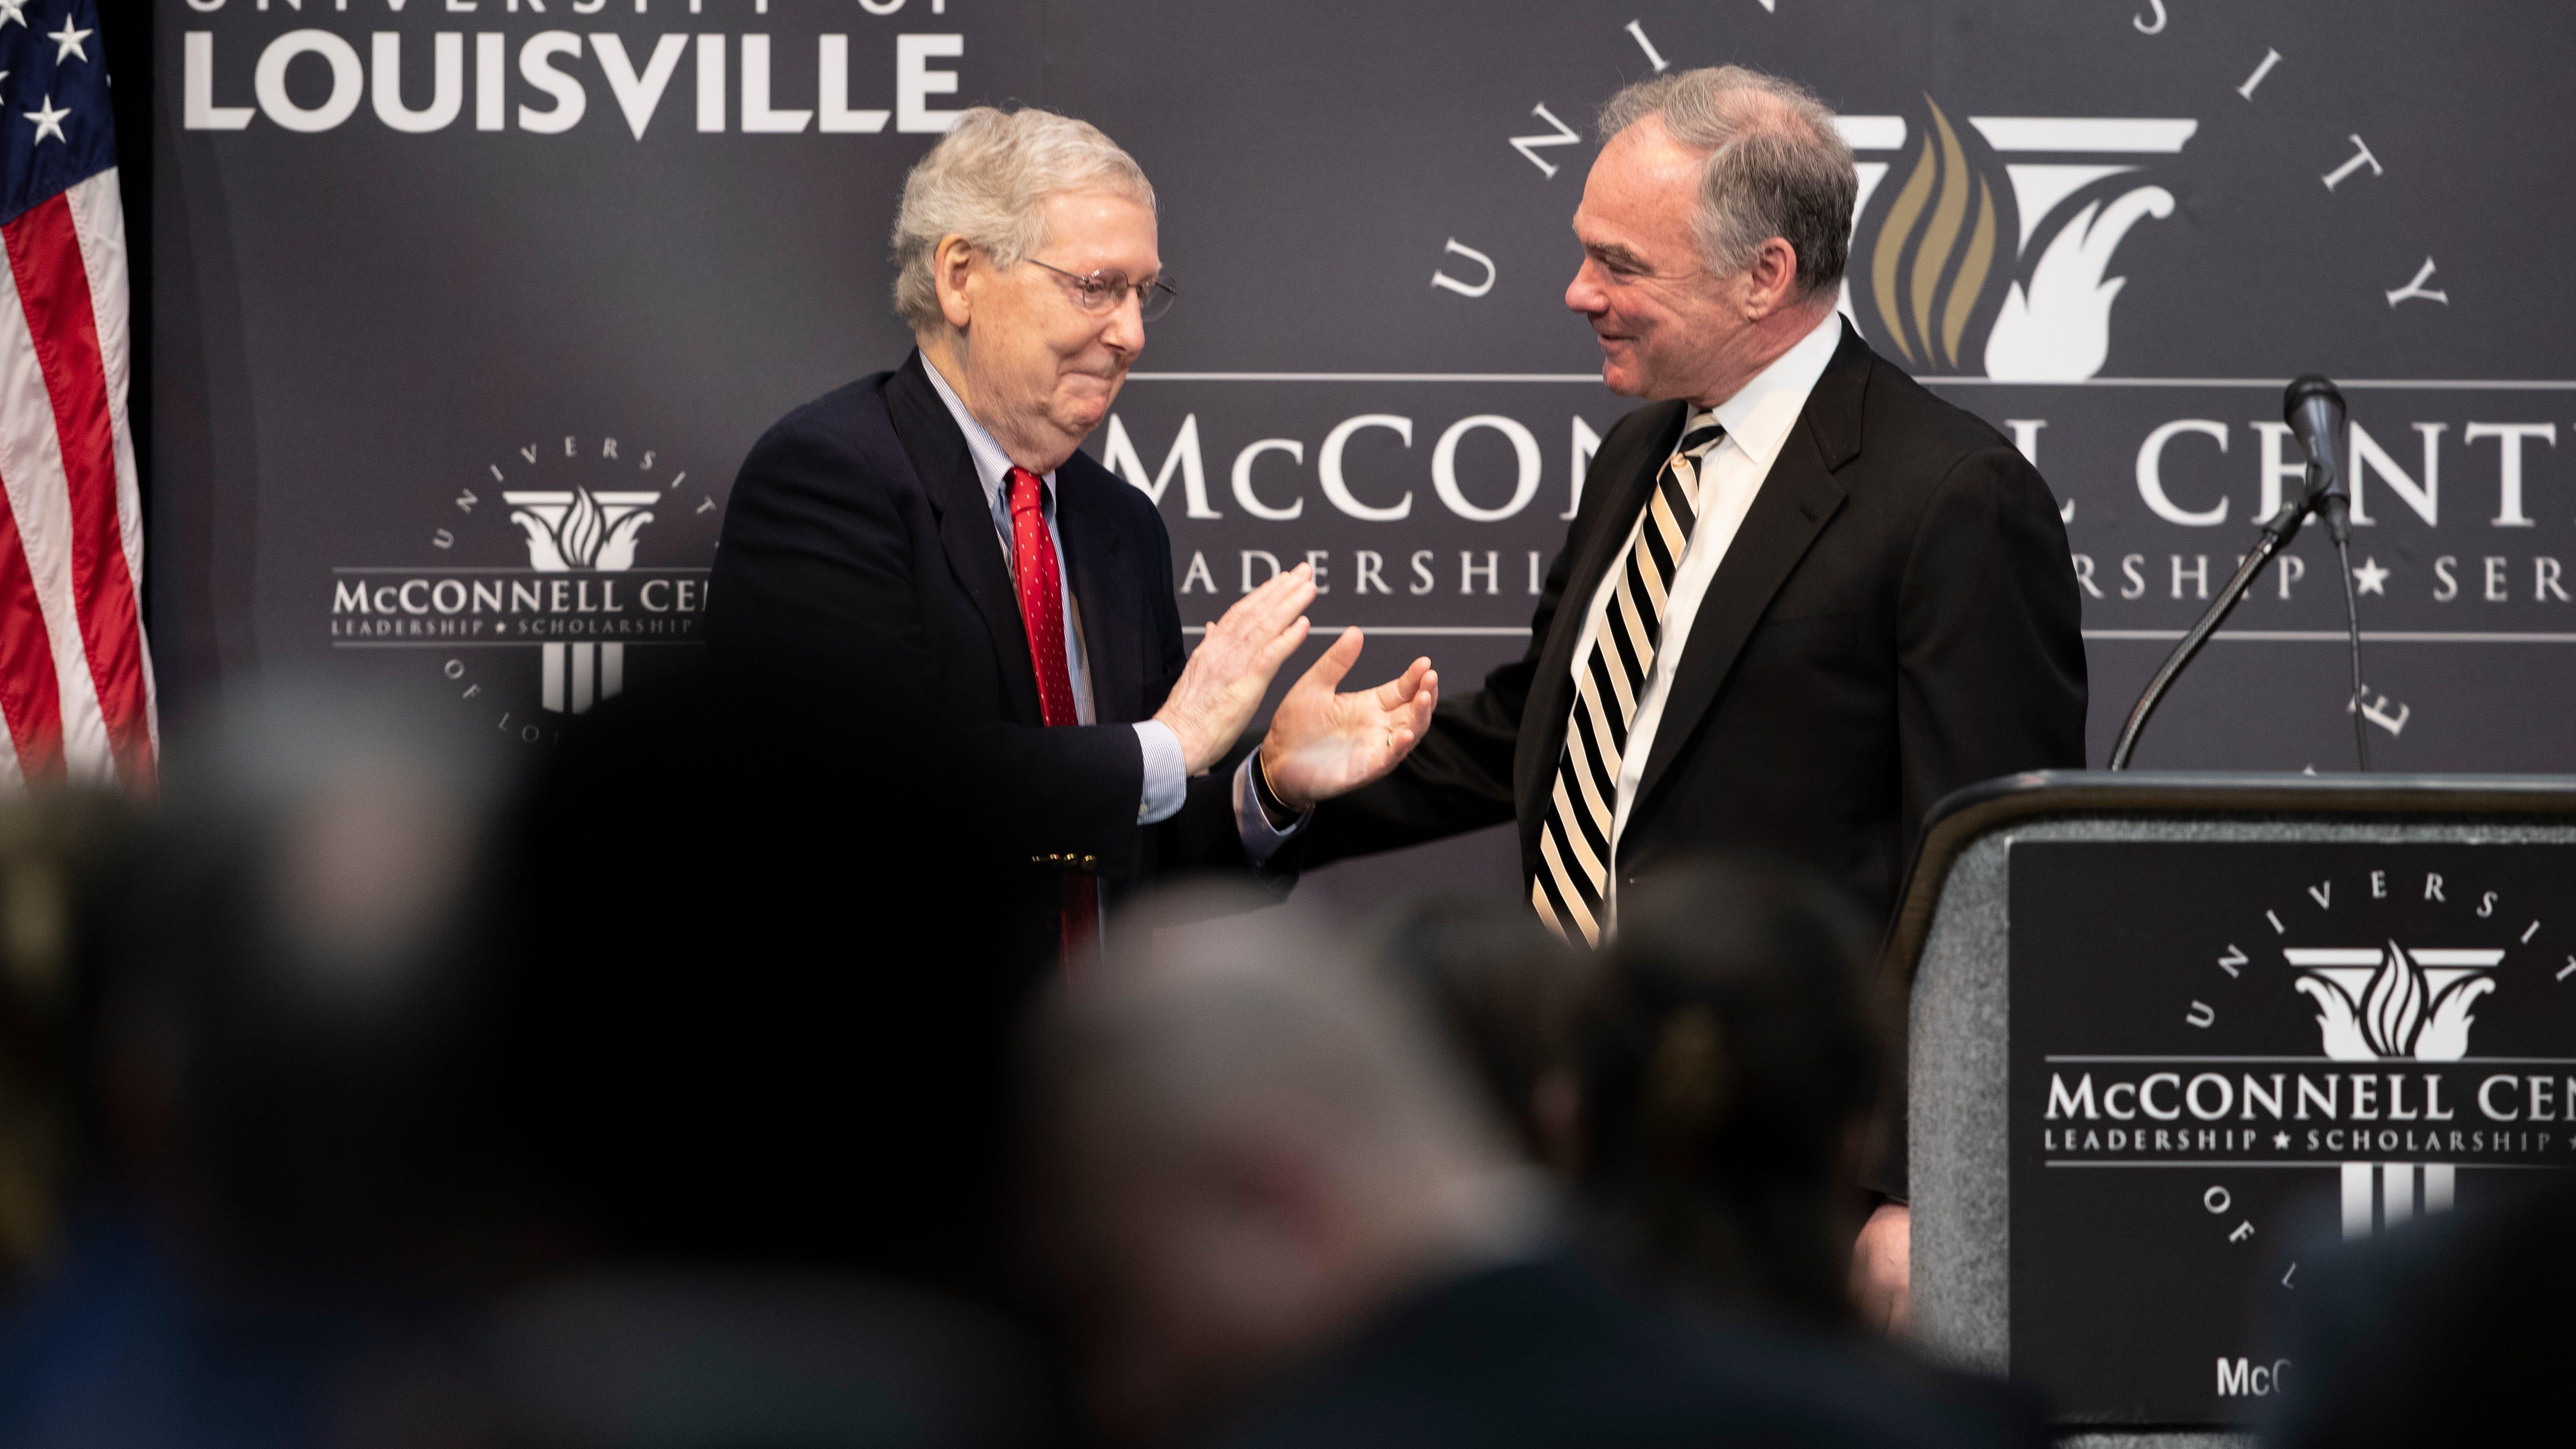 Senate Majority Leader Mitch McConnell, left, thanks Senator Tim Kaine for speaking at the University of Louisville's McConnell Center. April 1, 2019.